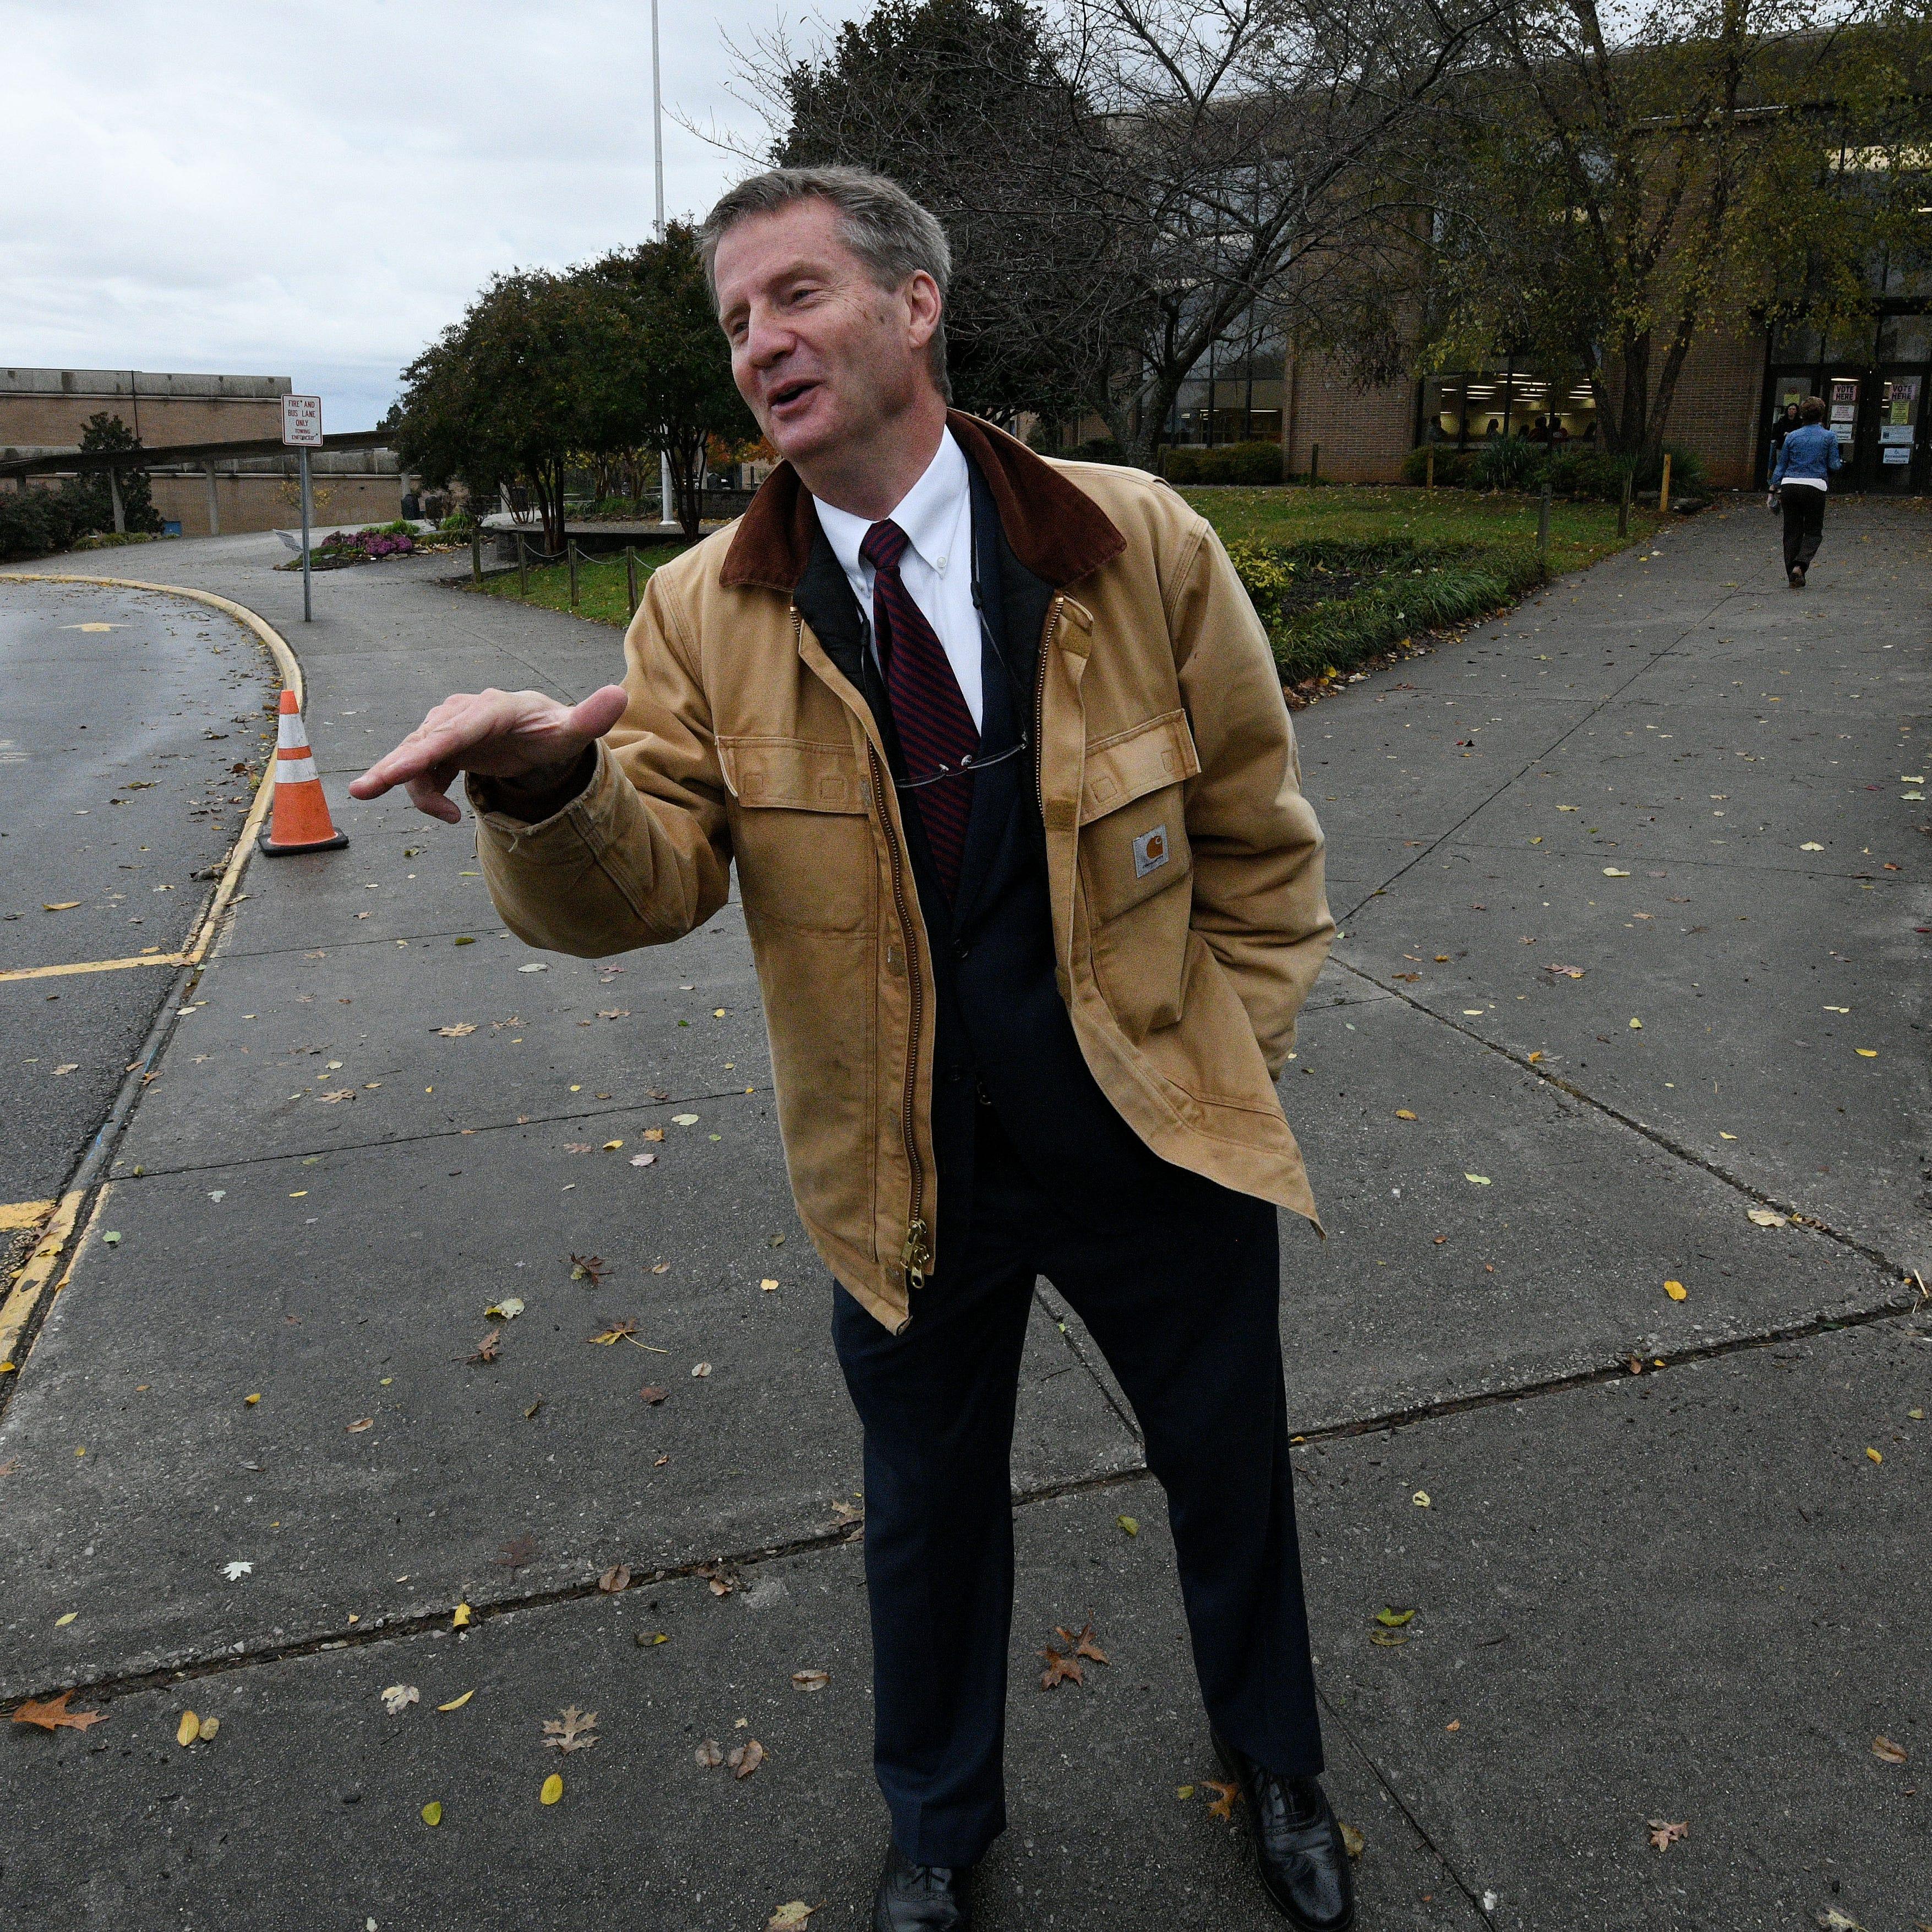 Outsider again: Tim Burchett prepares to take 2nd District seat as member of GOP minority